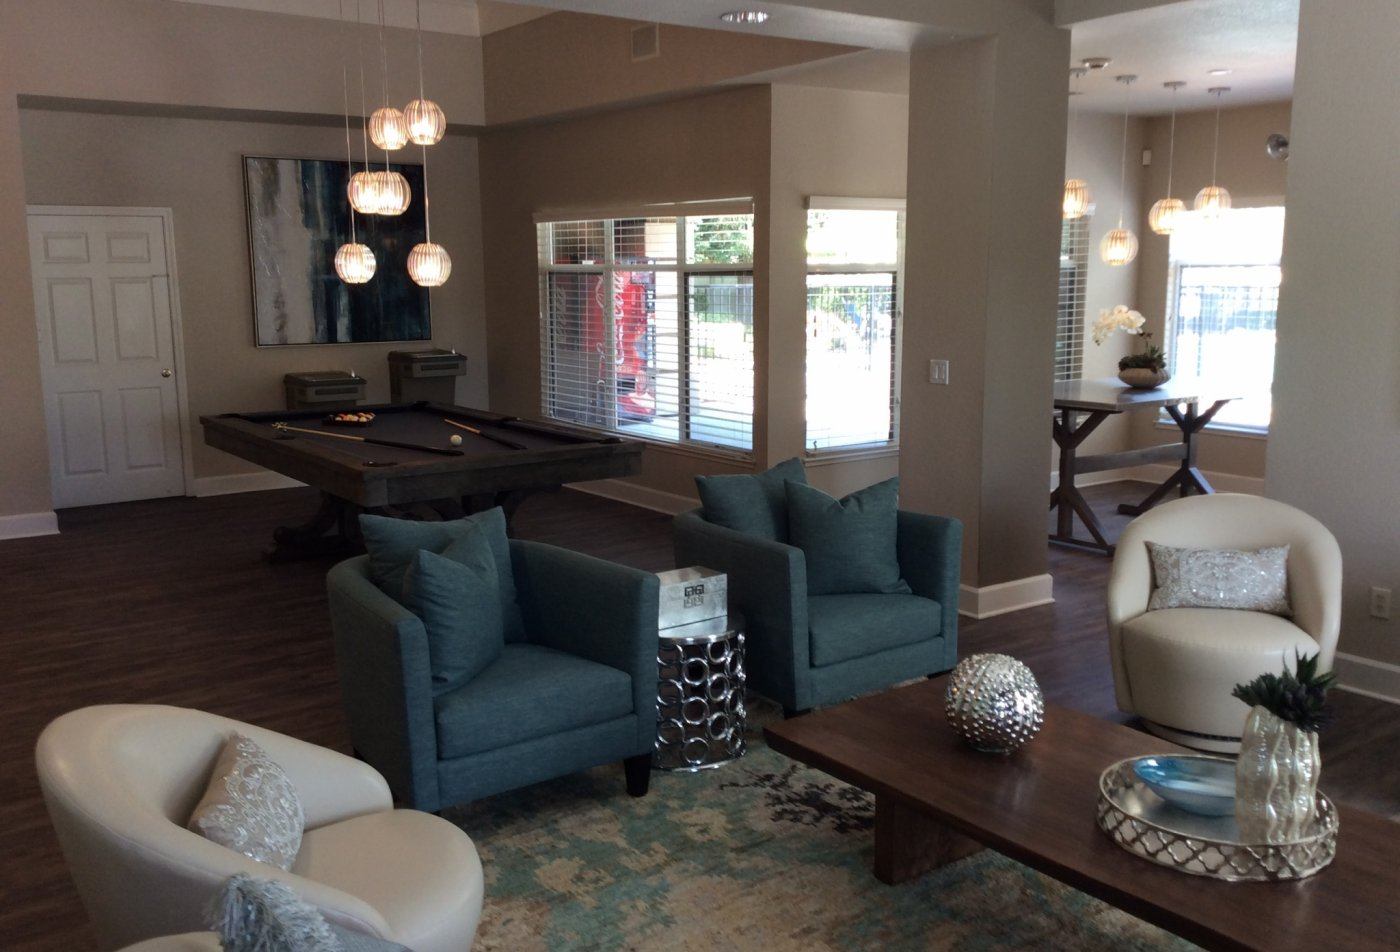 apartments in folsom l sherwood apartment homes in folsom, ca